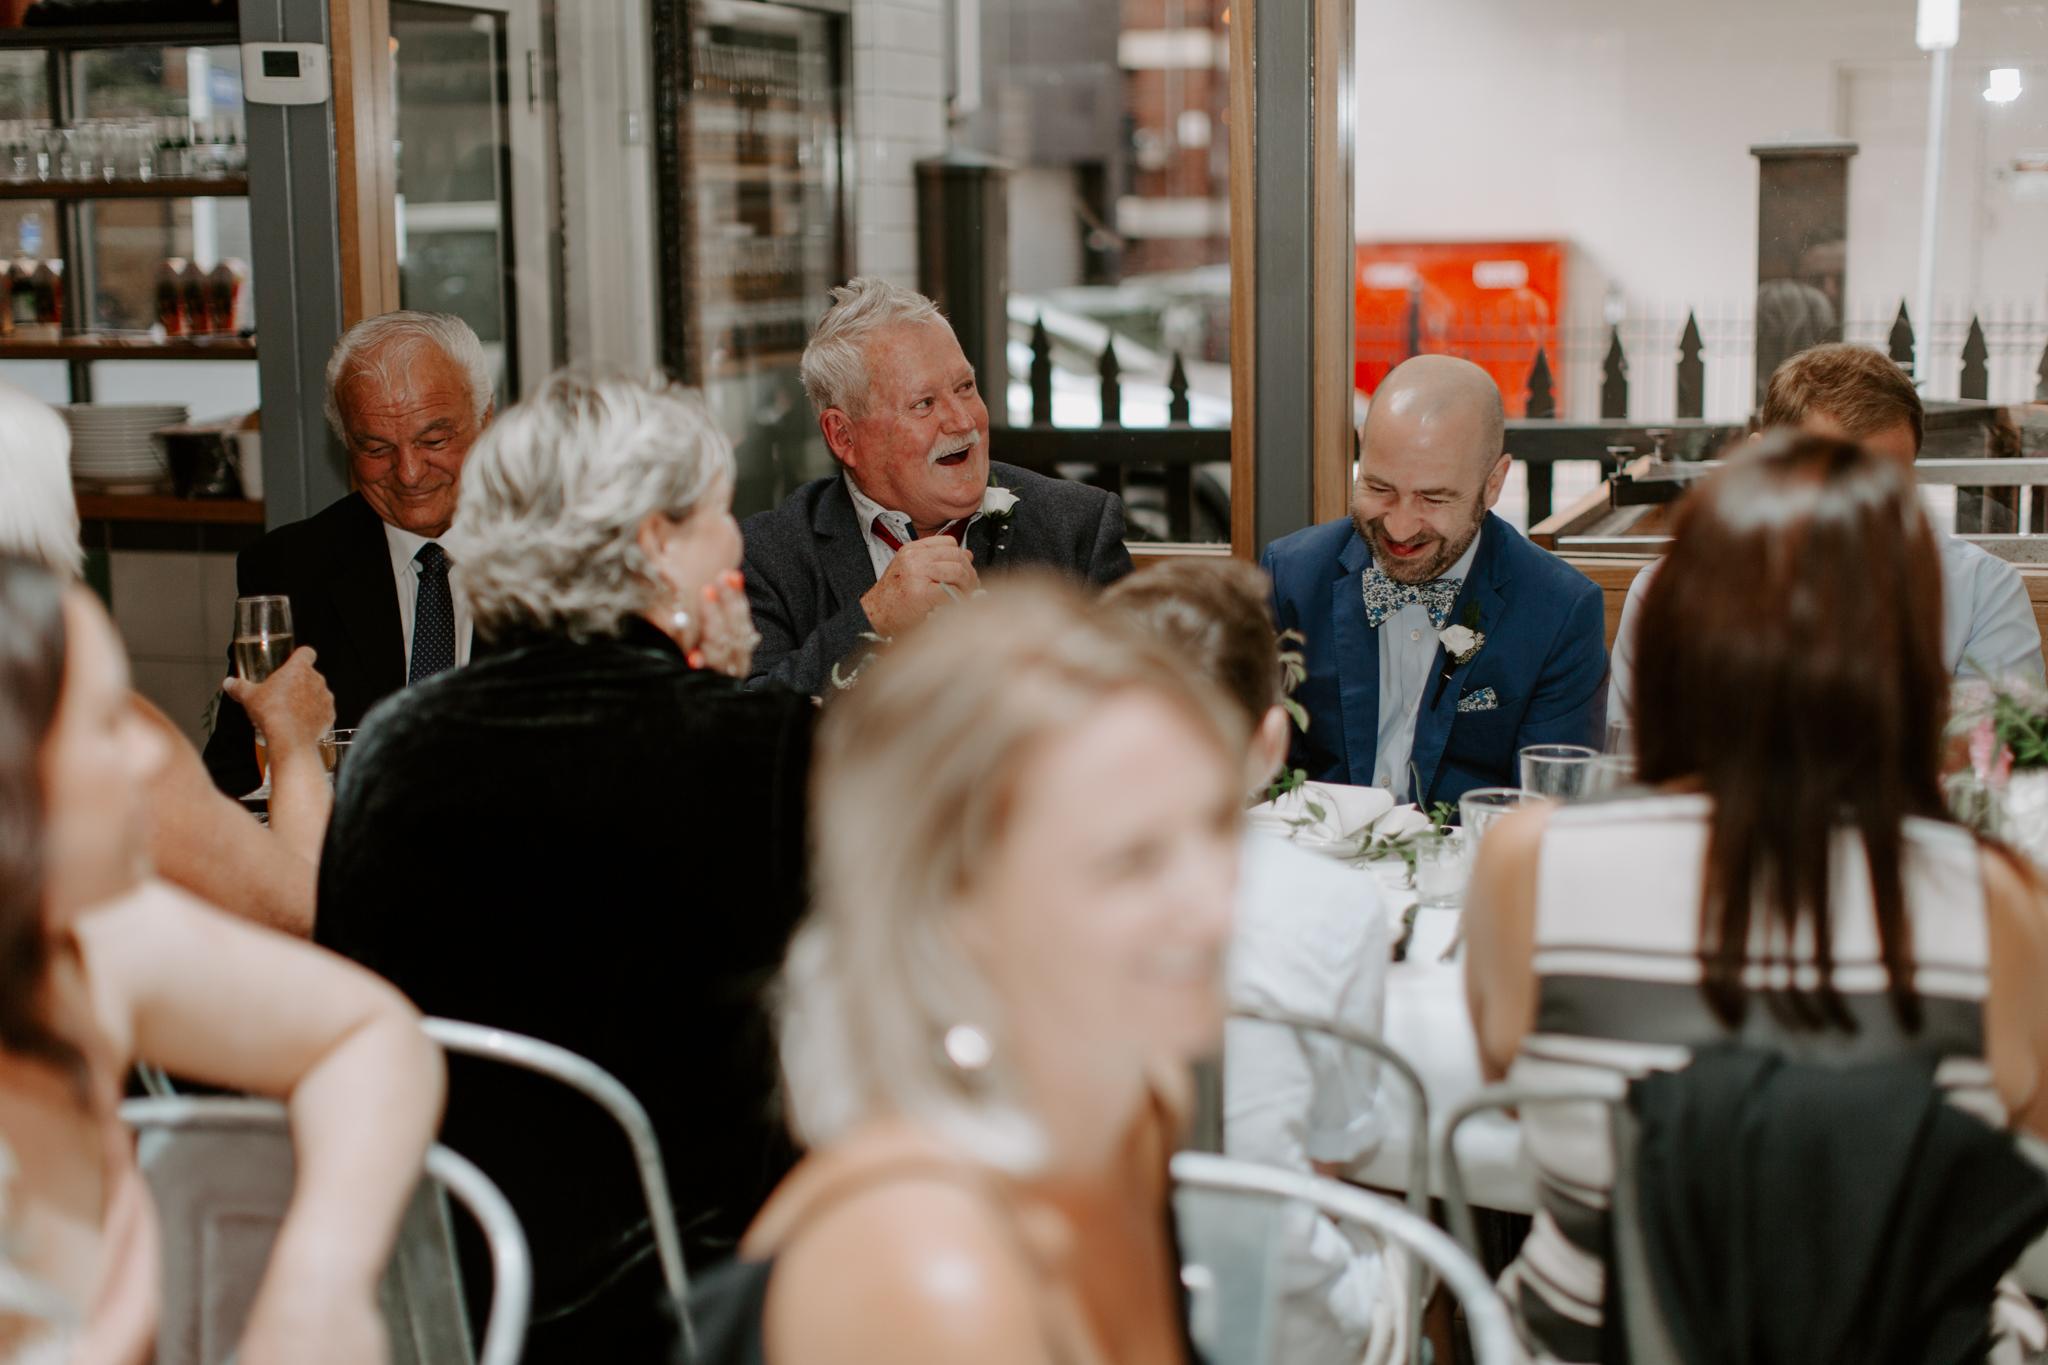 Trunk-restaurant-wedding-EmotionsandMath-068.jpg